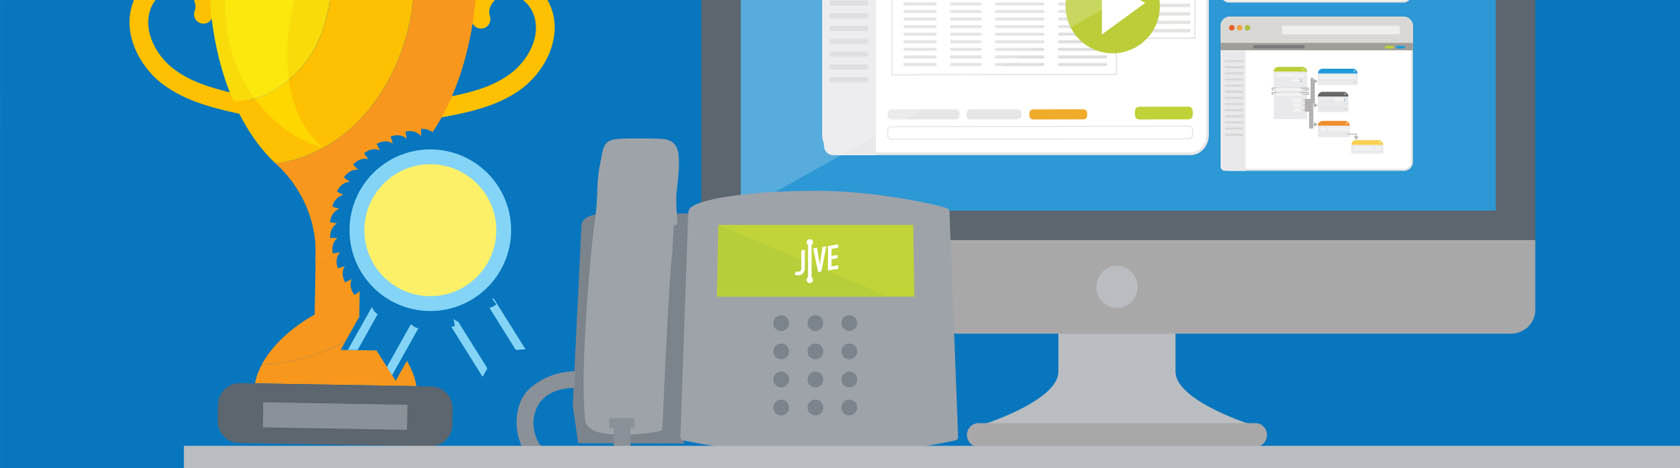 Jive Solutions Provider